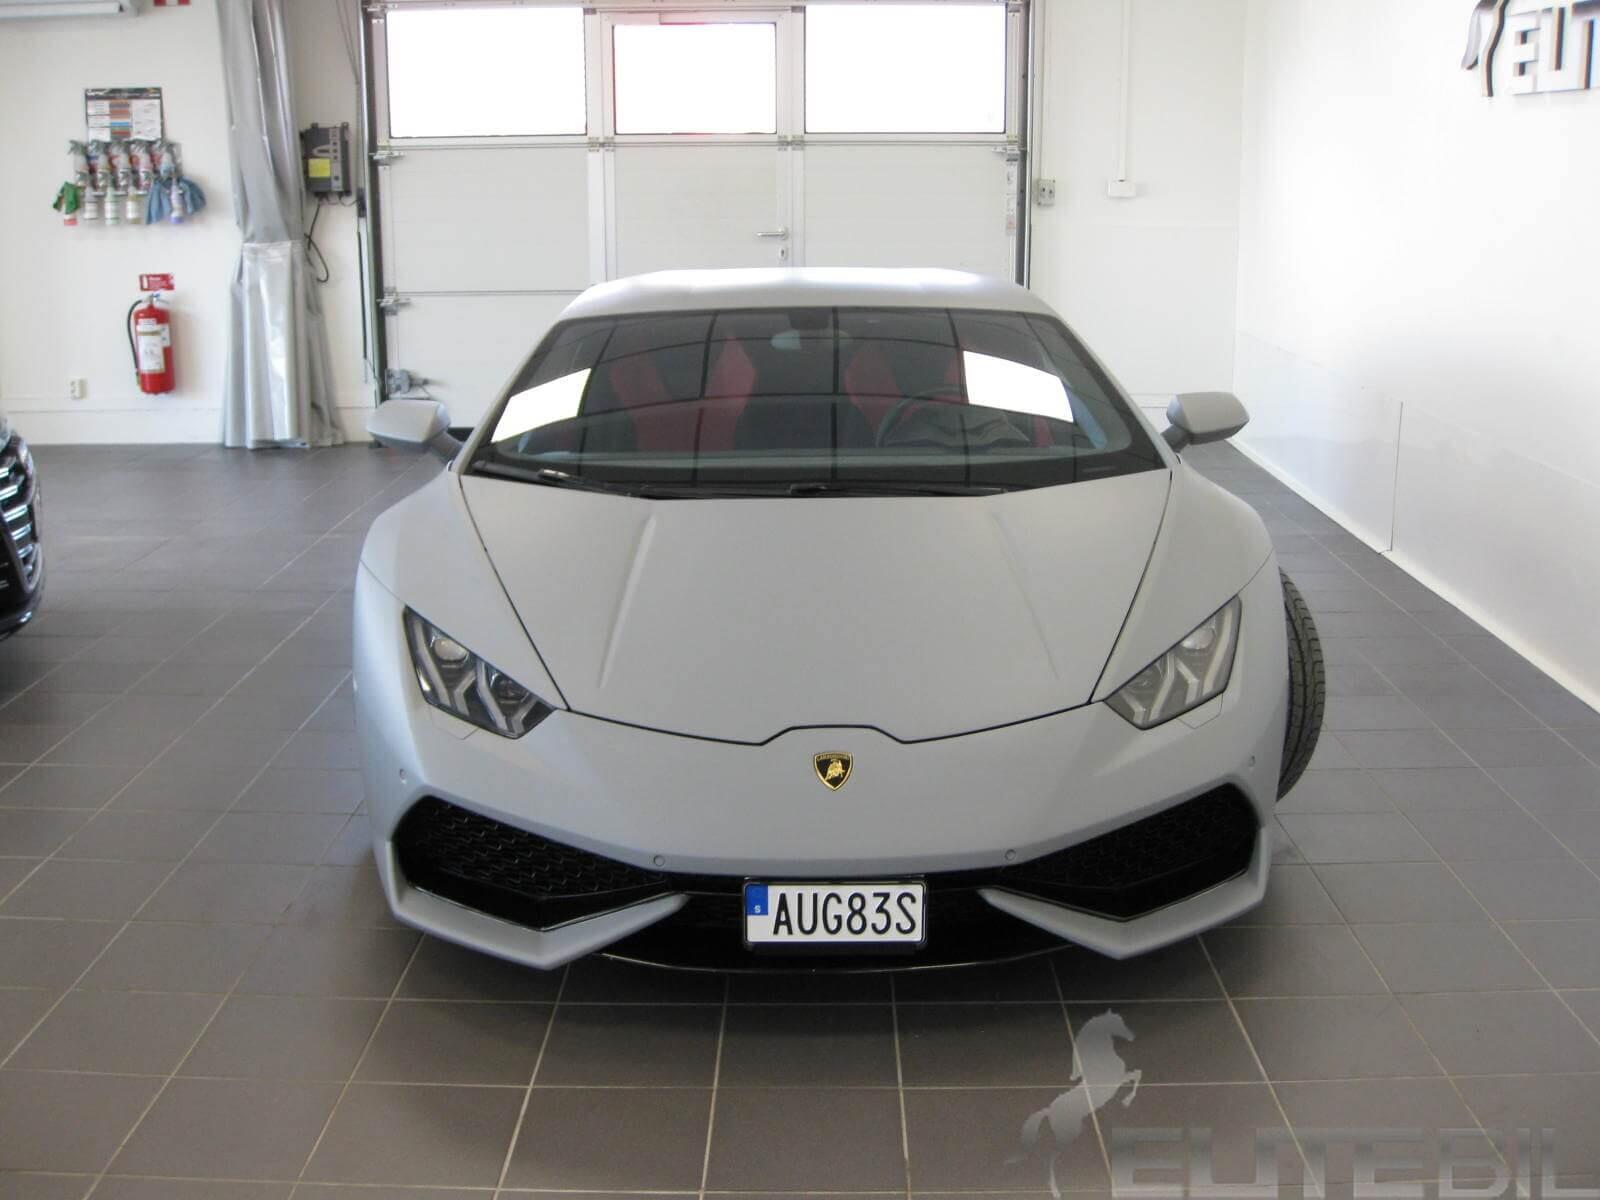 Lamborghini Huracán LP 610-4 DCT 610hk (3)